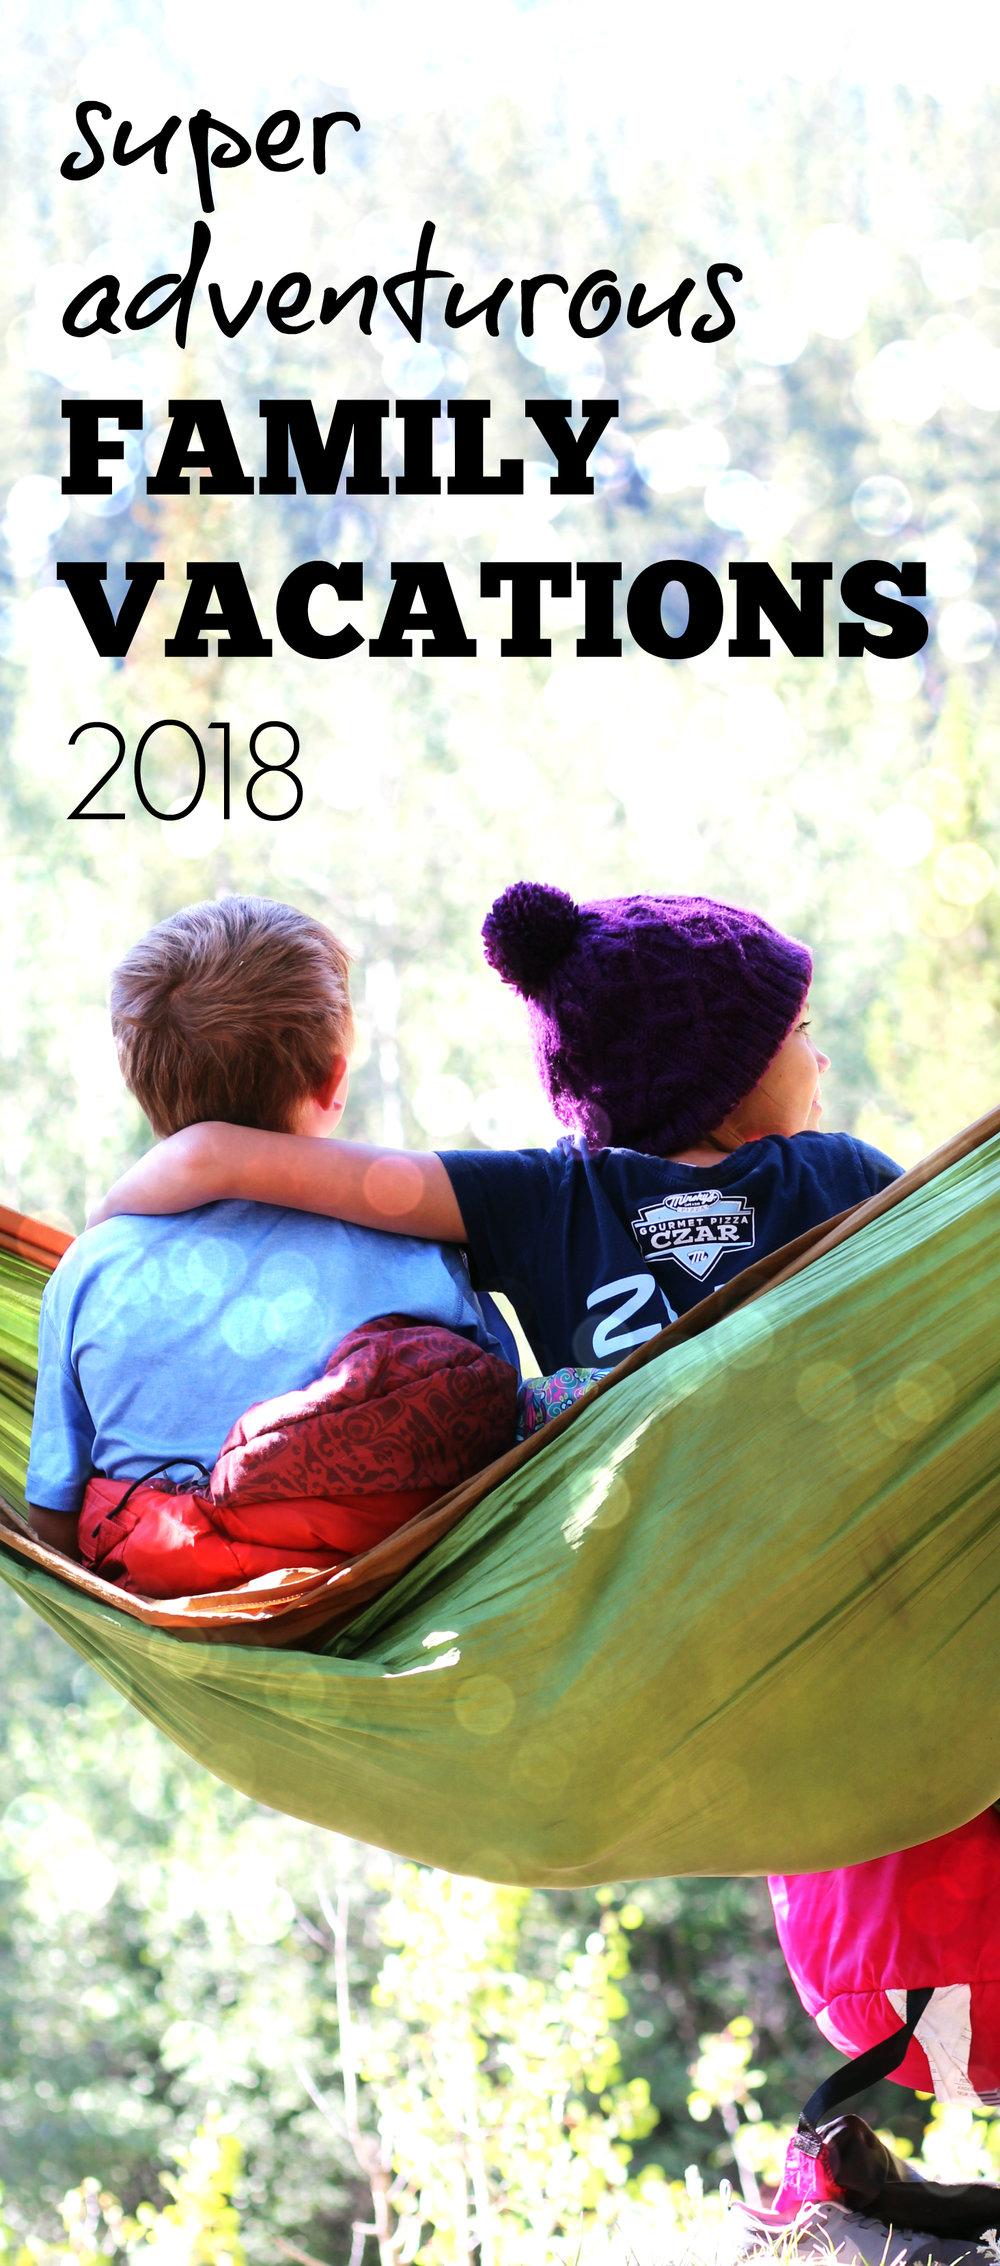 super+adventurous+family+vacations+2018.jpg